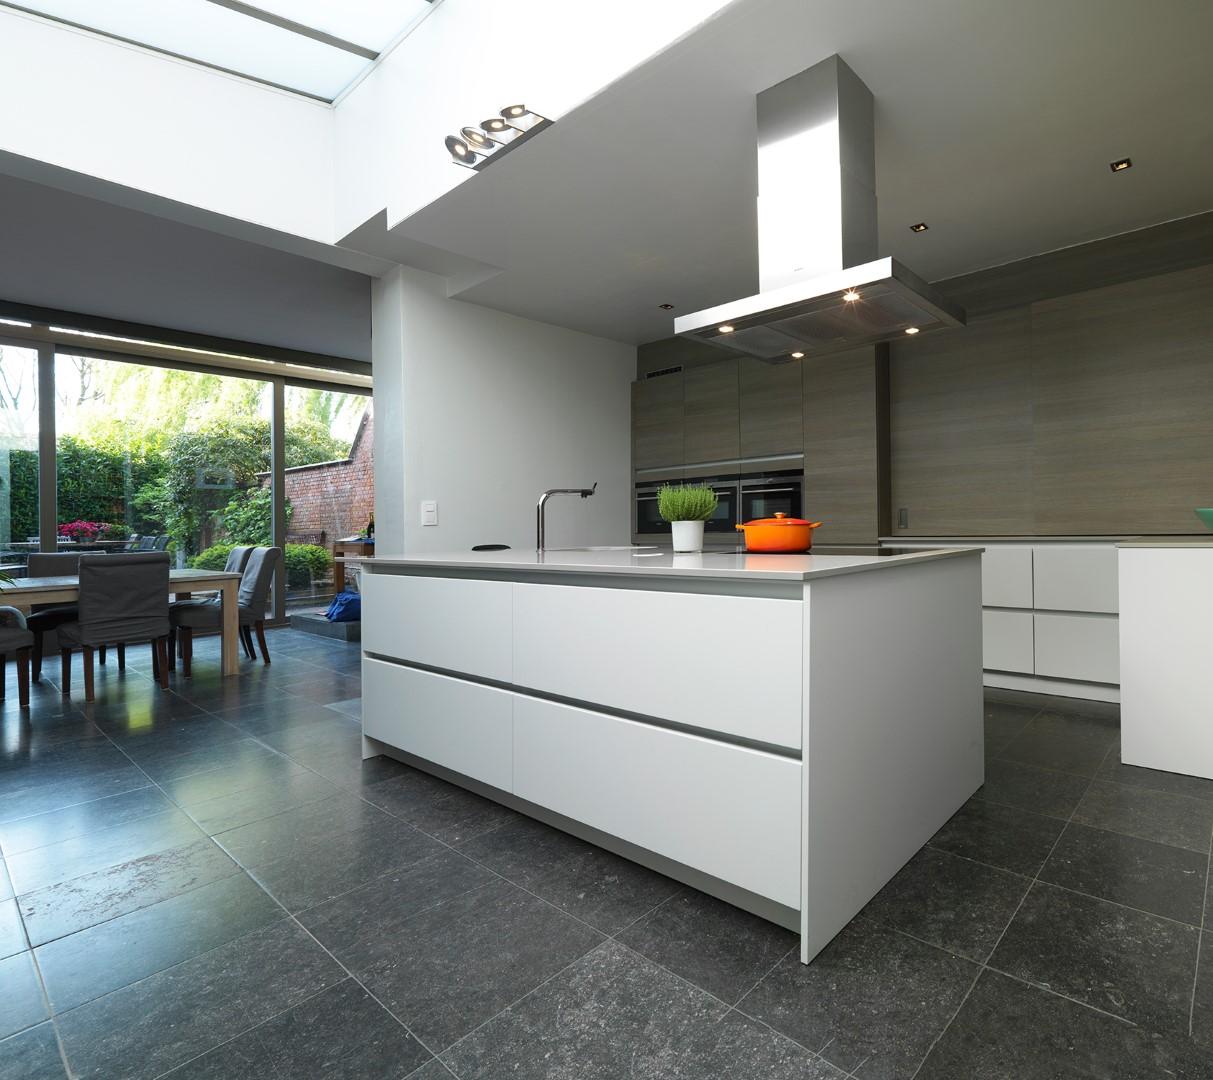 Moderne keuken realisaties keukens deba meubelen deba meubelen - Fotos moderne keuken ...